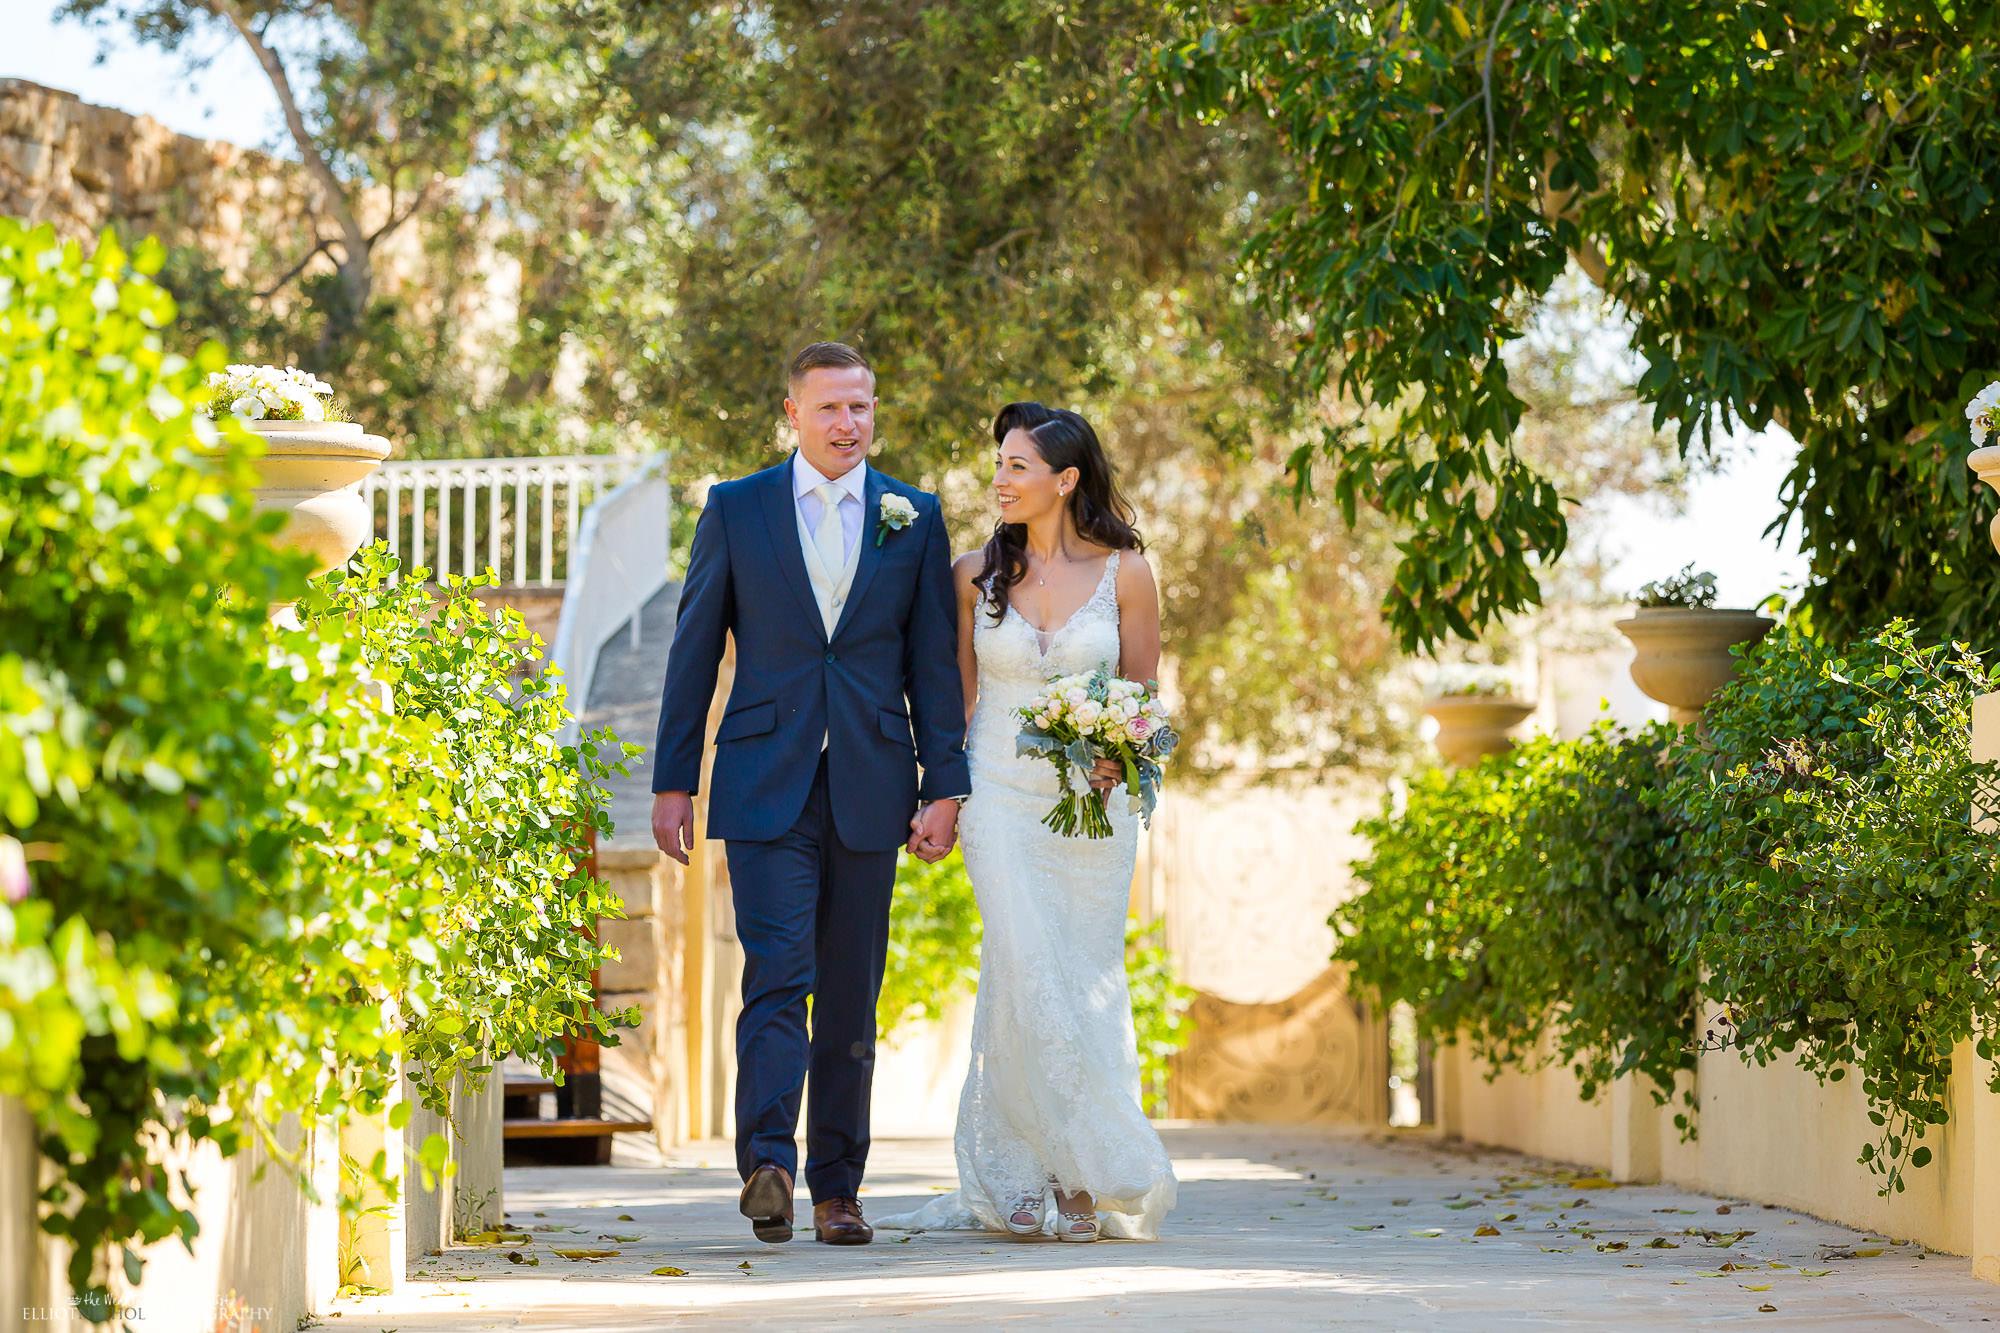 Newlyweds-arrive-garden-wedding-reception-destination-weddings-photographer